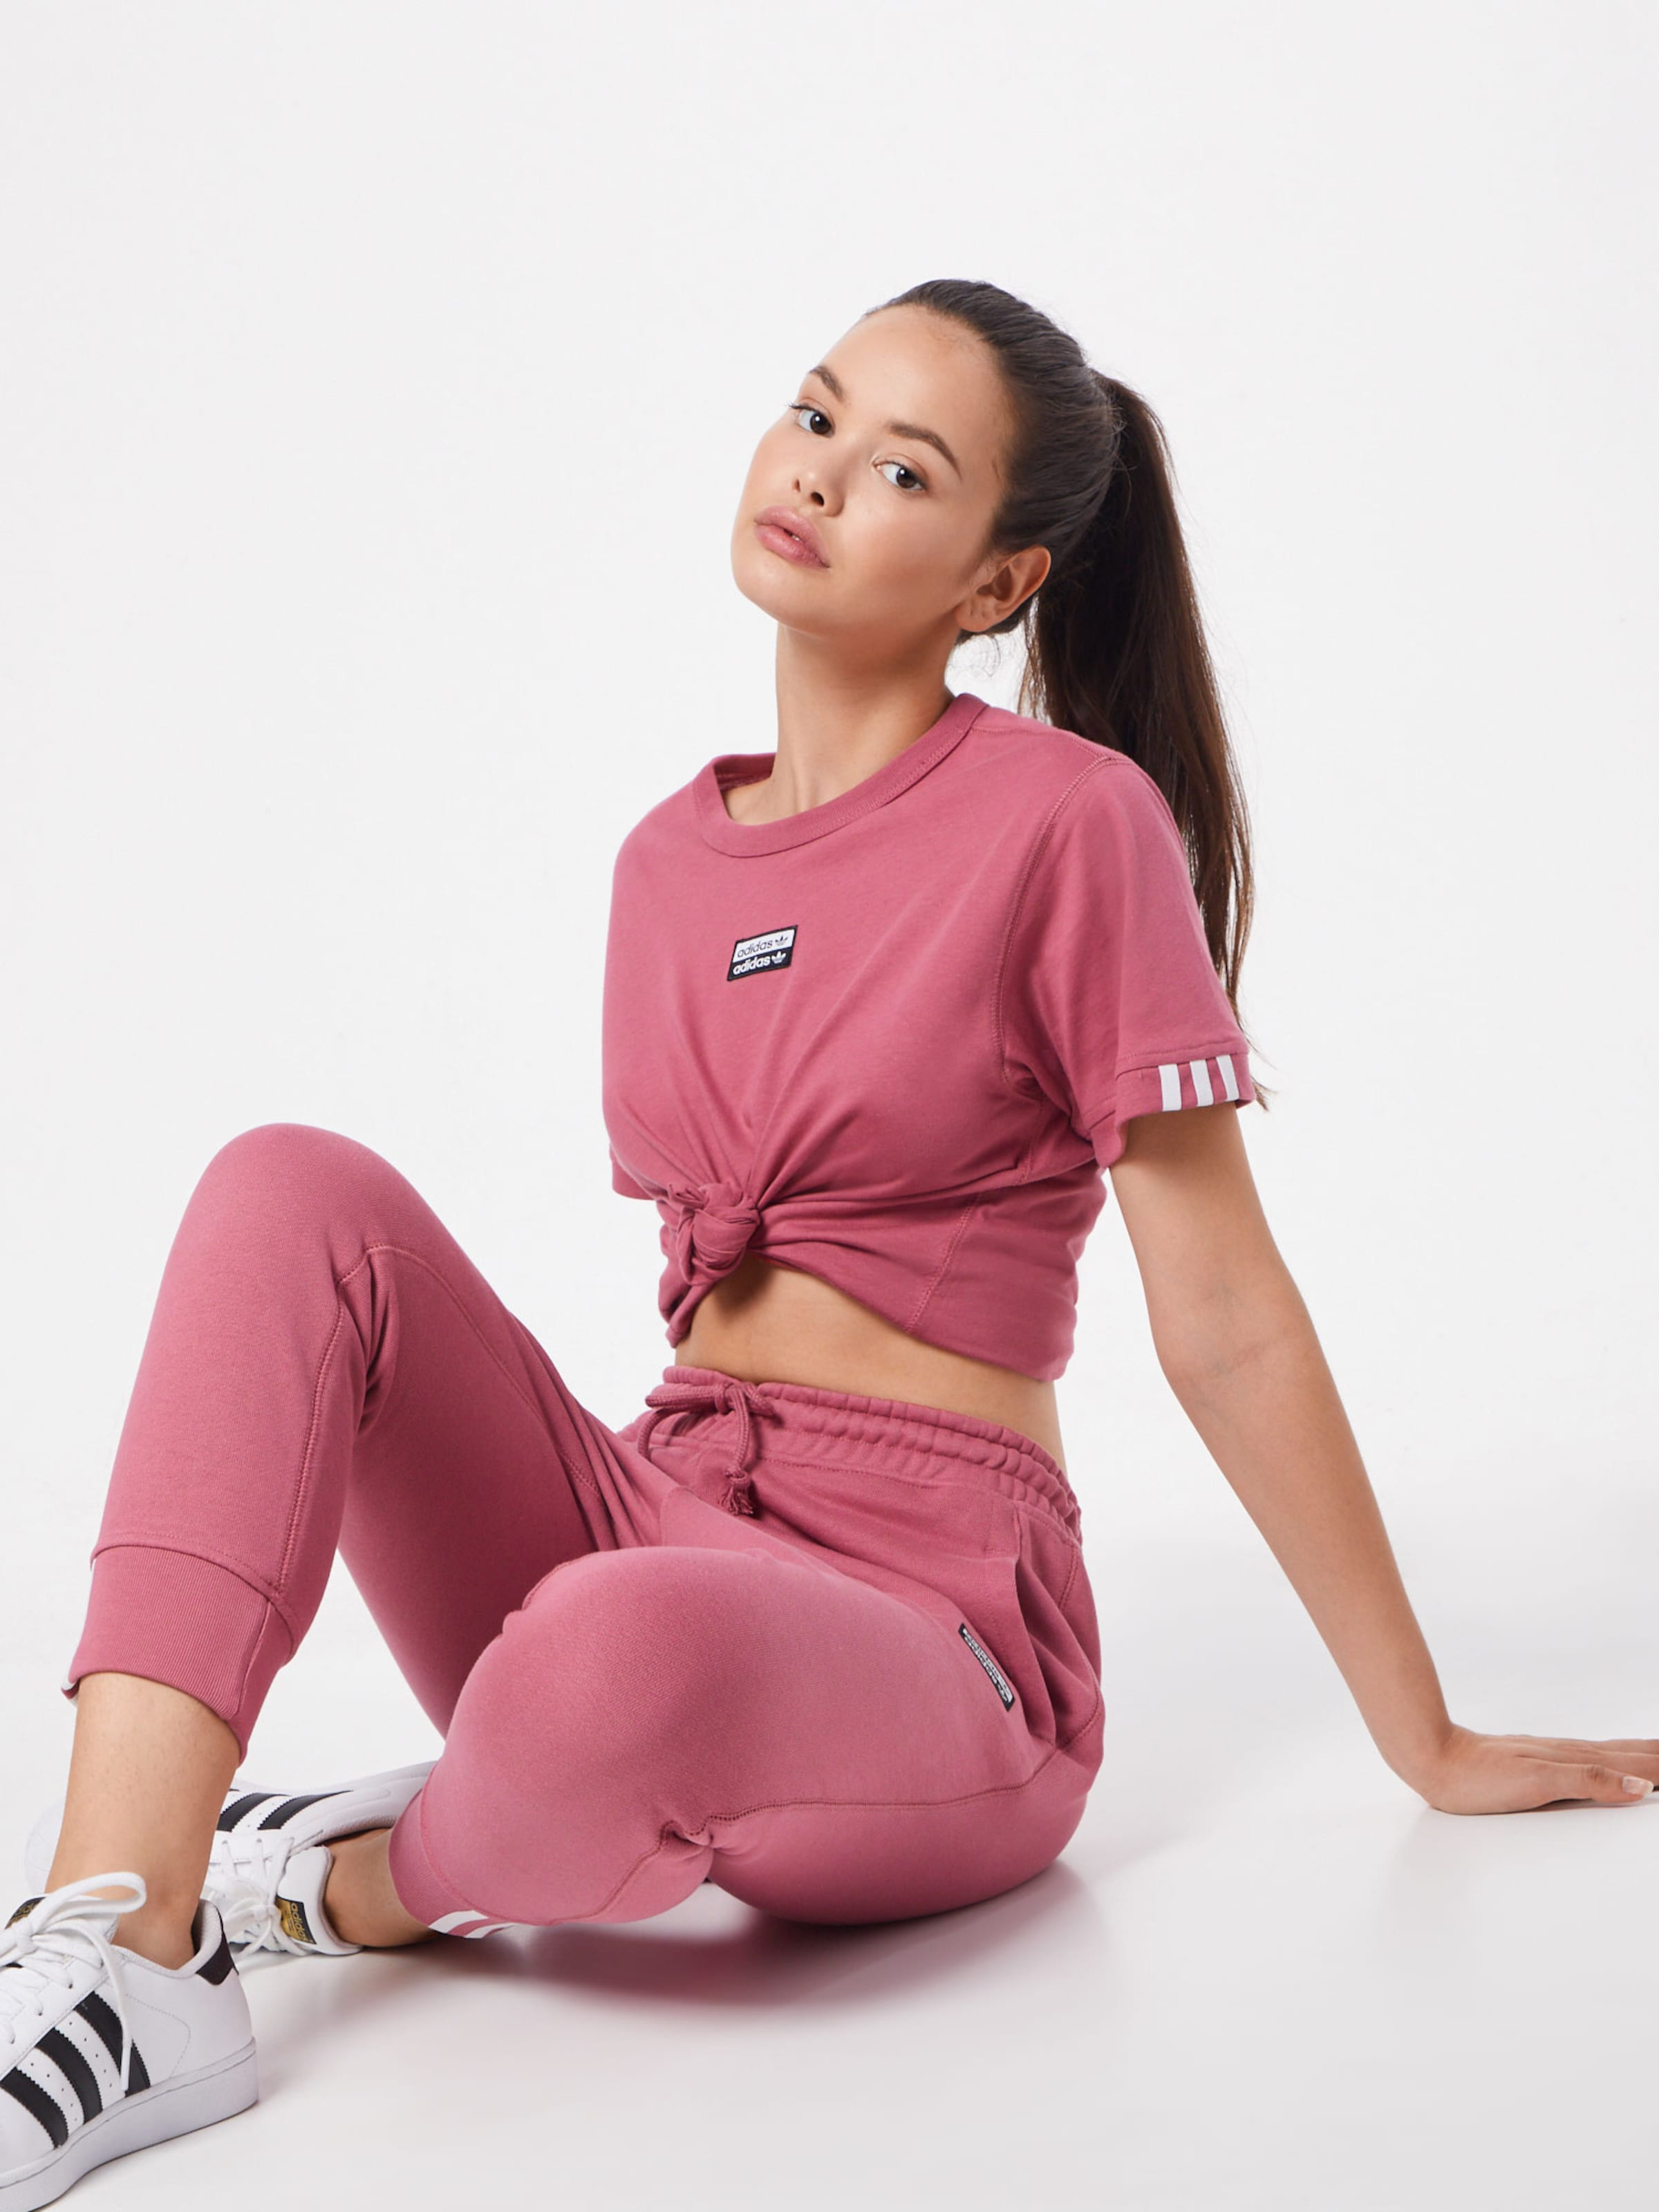 Originals Adidas Rosé 'vocal' Hose In KlTJ1cF